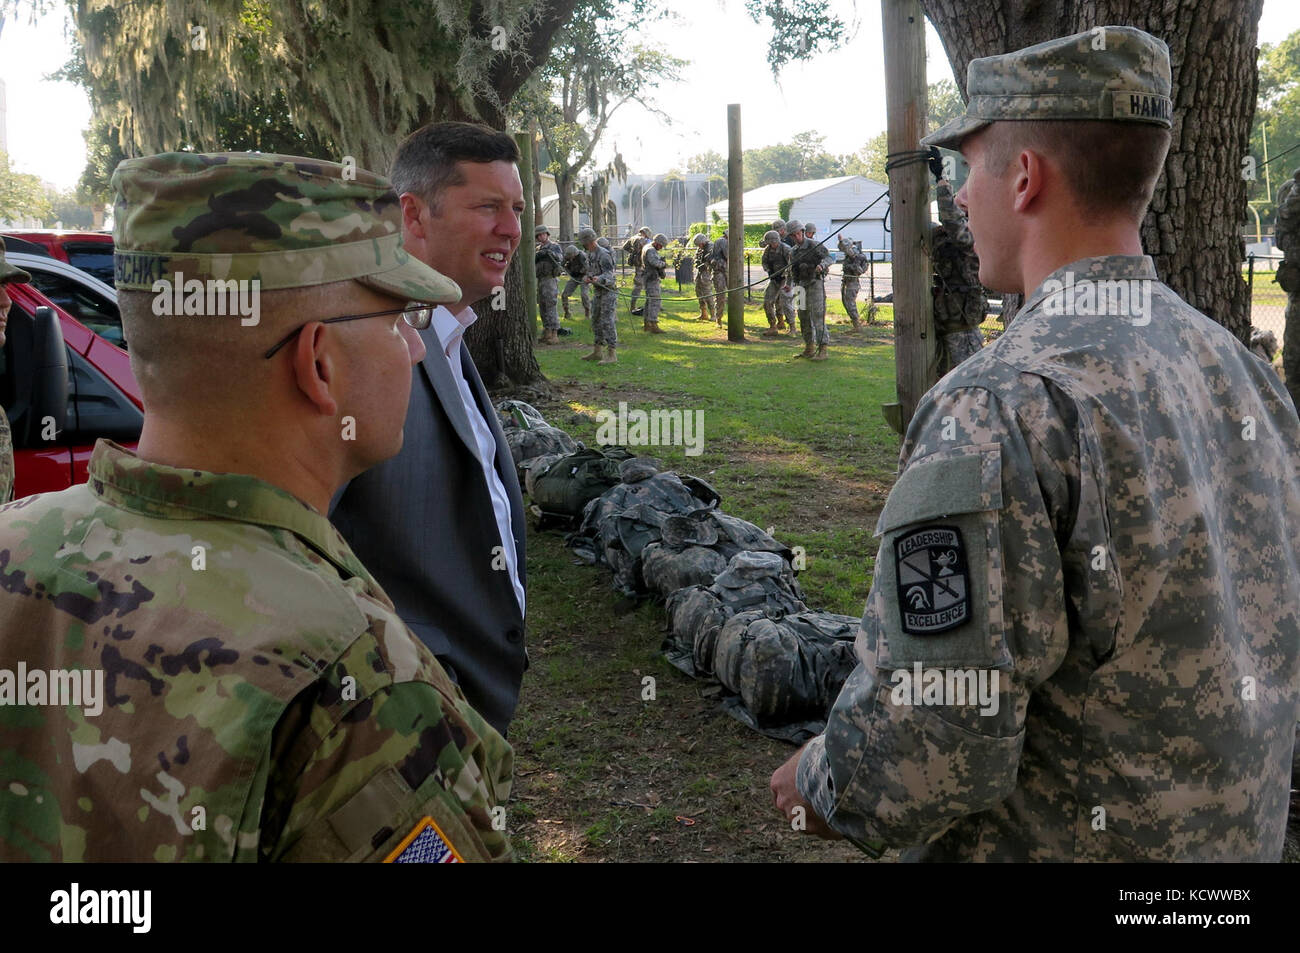 Under Secretary of the Army Mr  Patrick J  Murphy observes